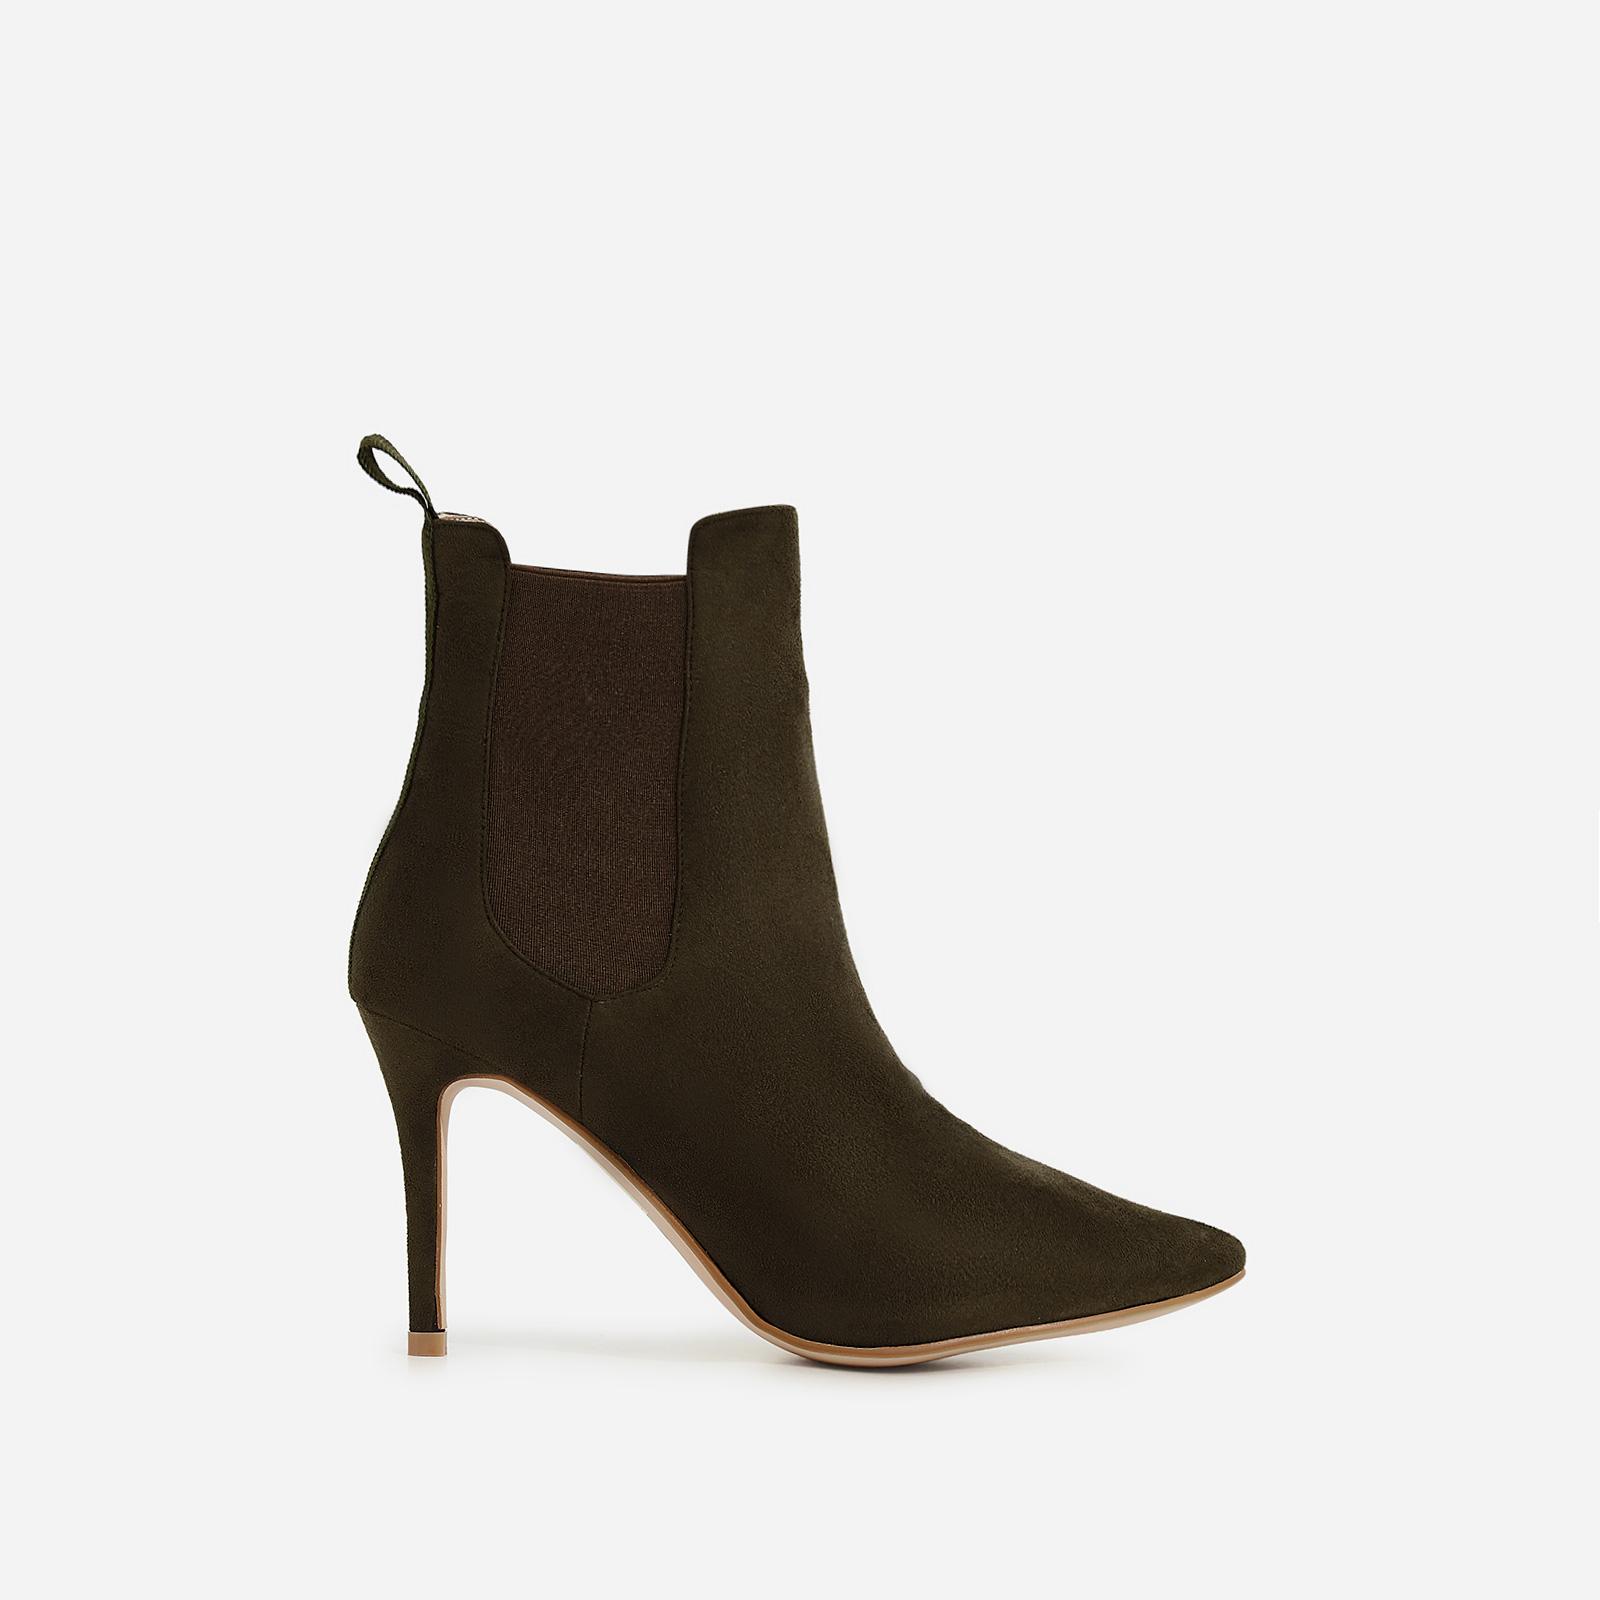 Hettie Elasticated Ankle Boot In Khaki Faux Suede